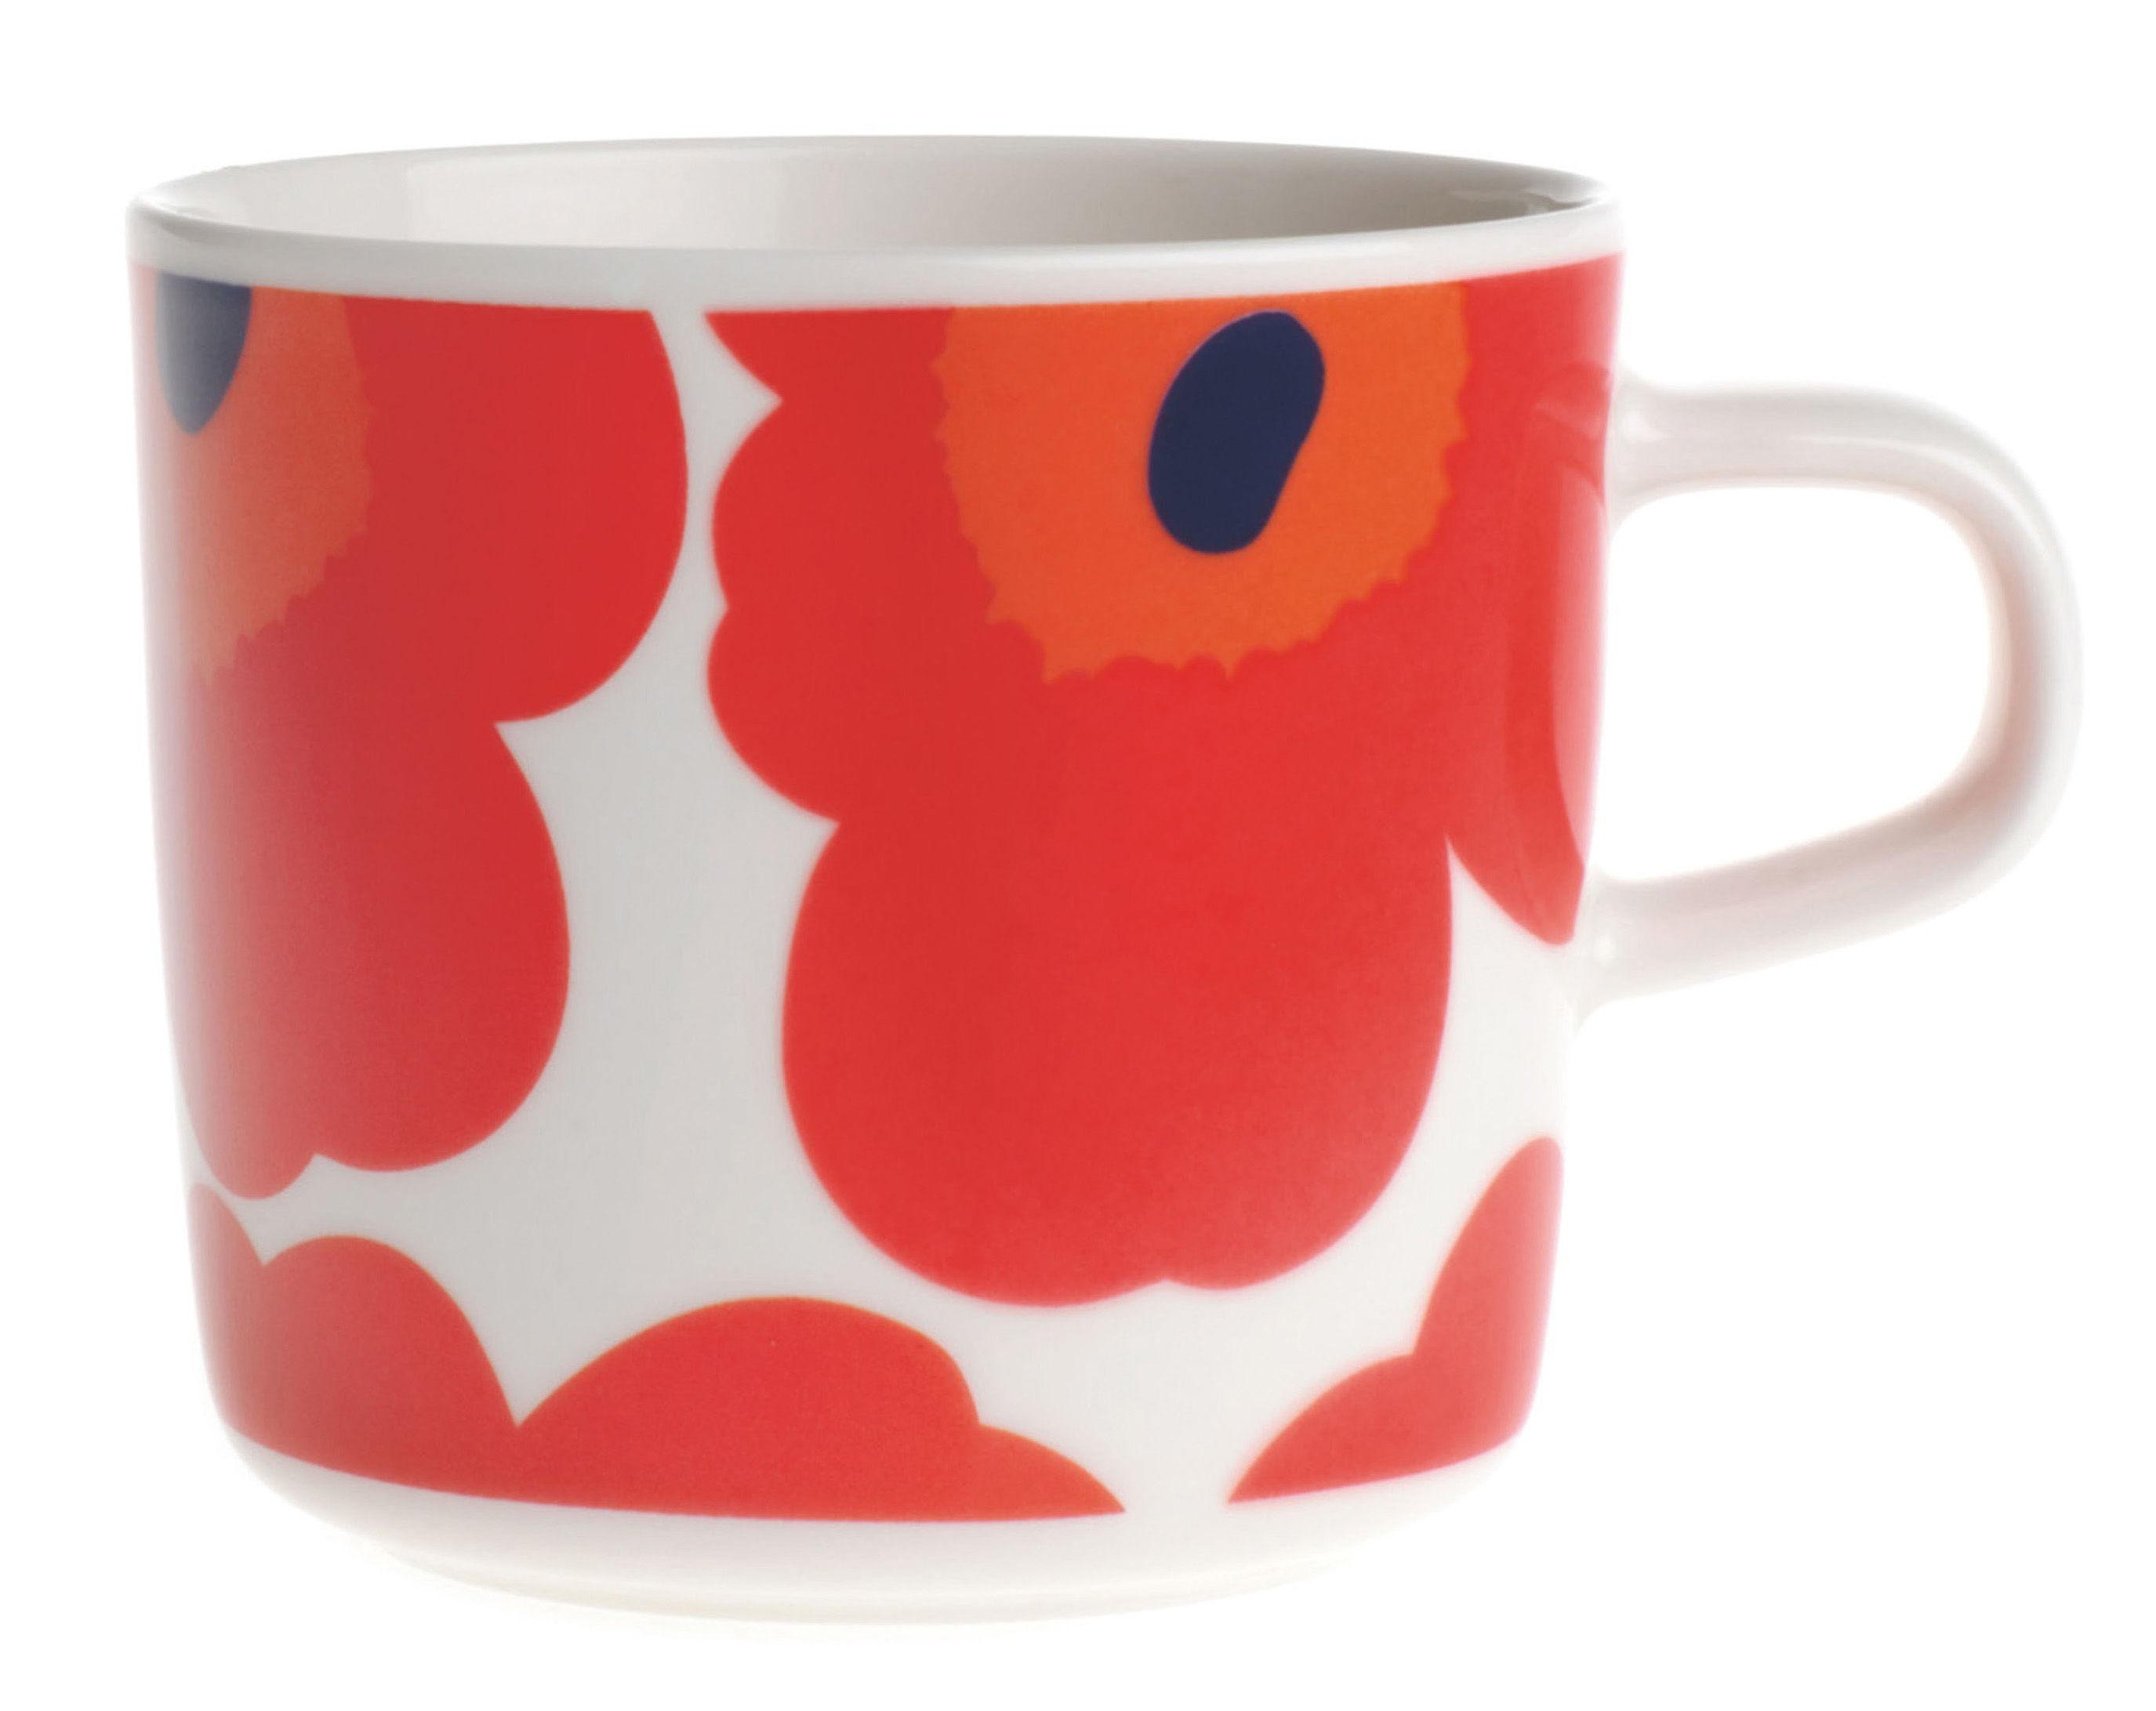 Tableware - Coffee Mugs & Tea Cups - Unikko Coffee cup by Marimekko - Unikko - White & red - Enamelled china